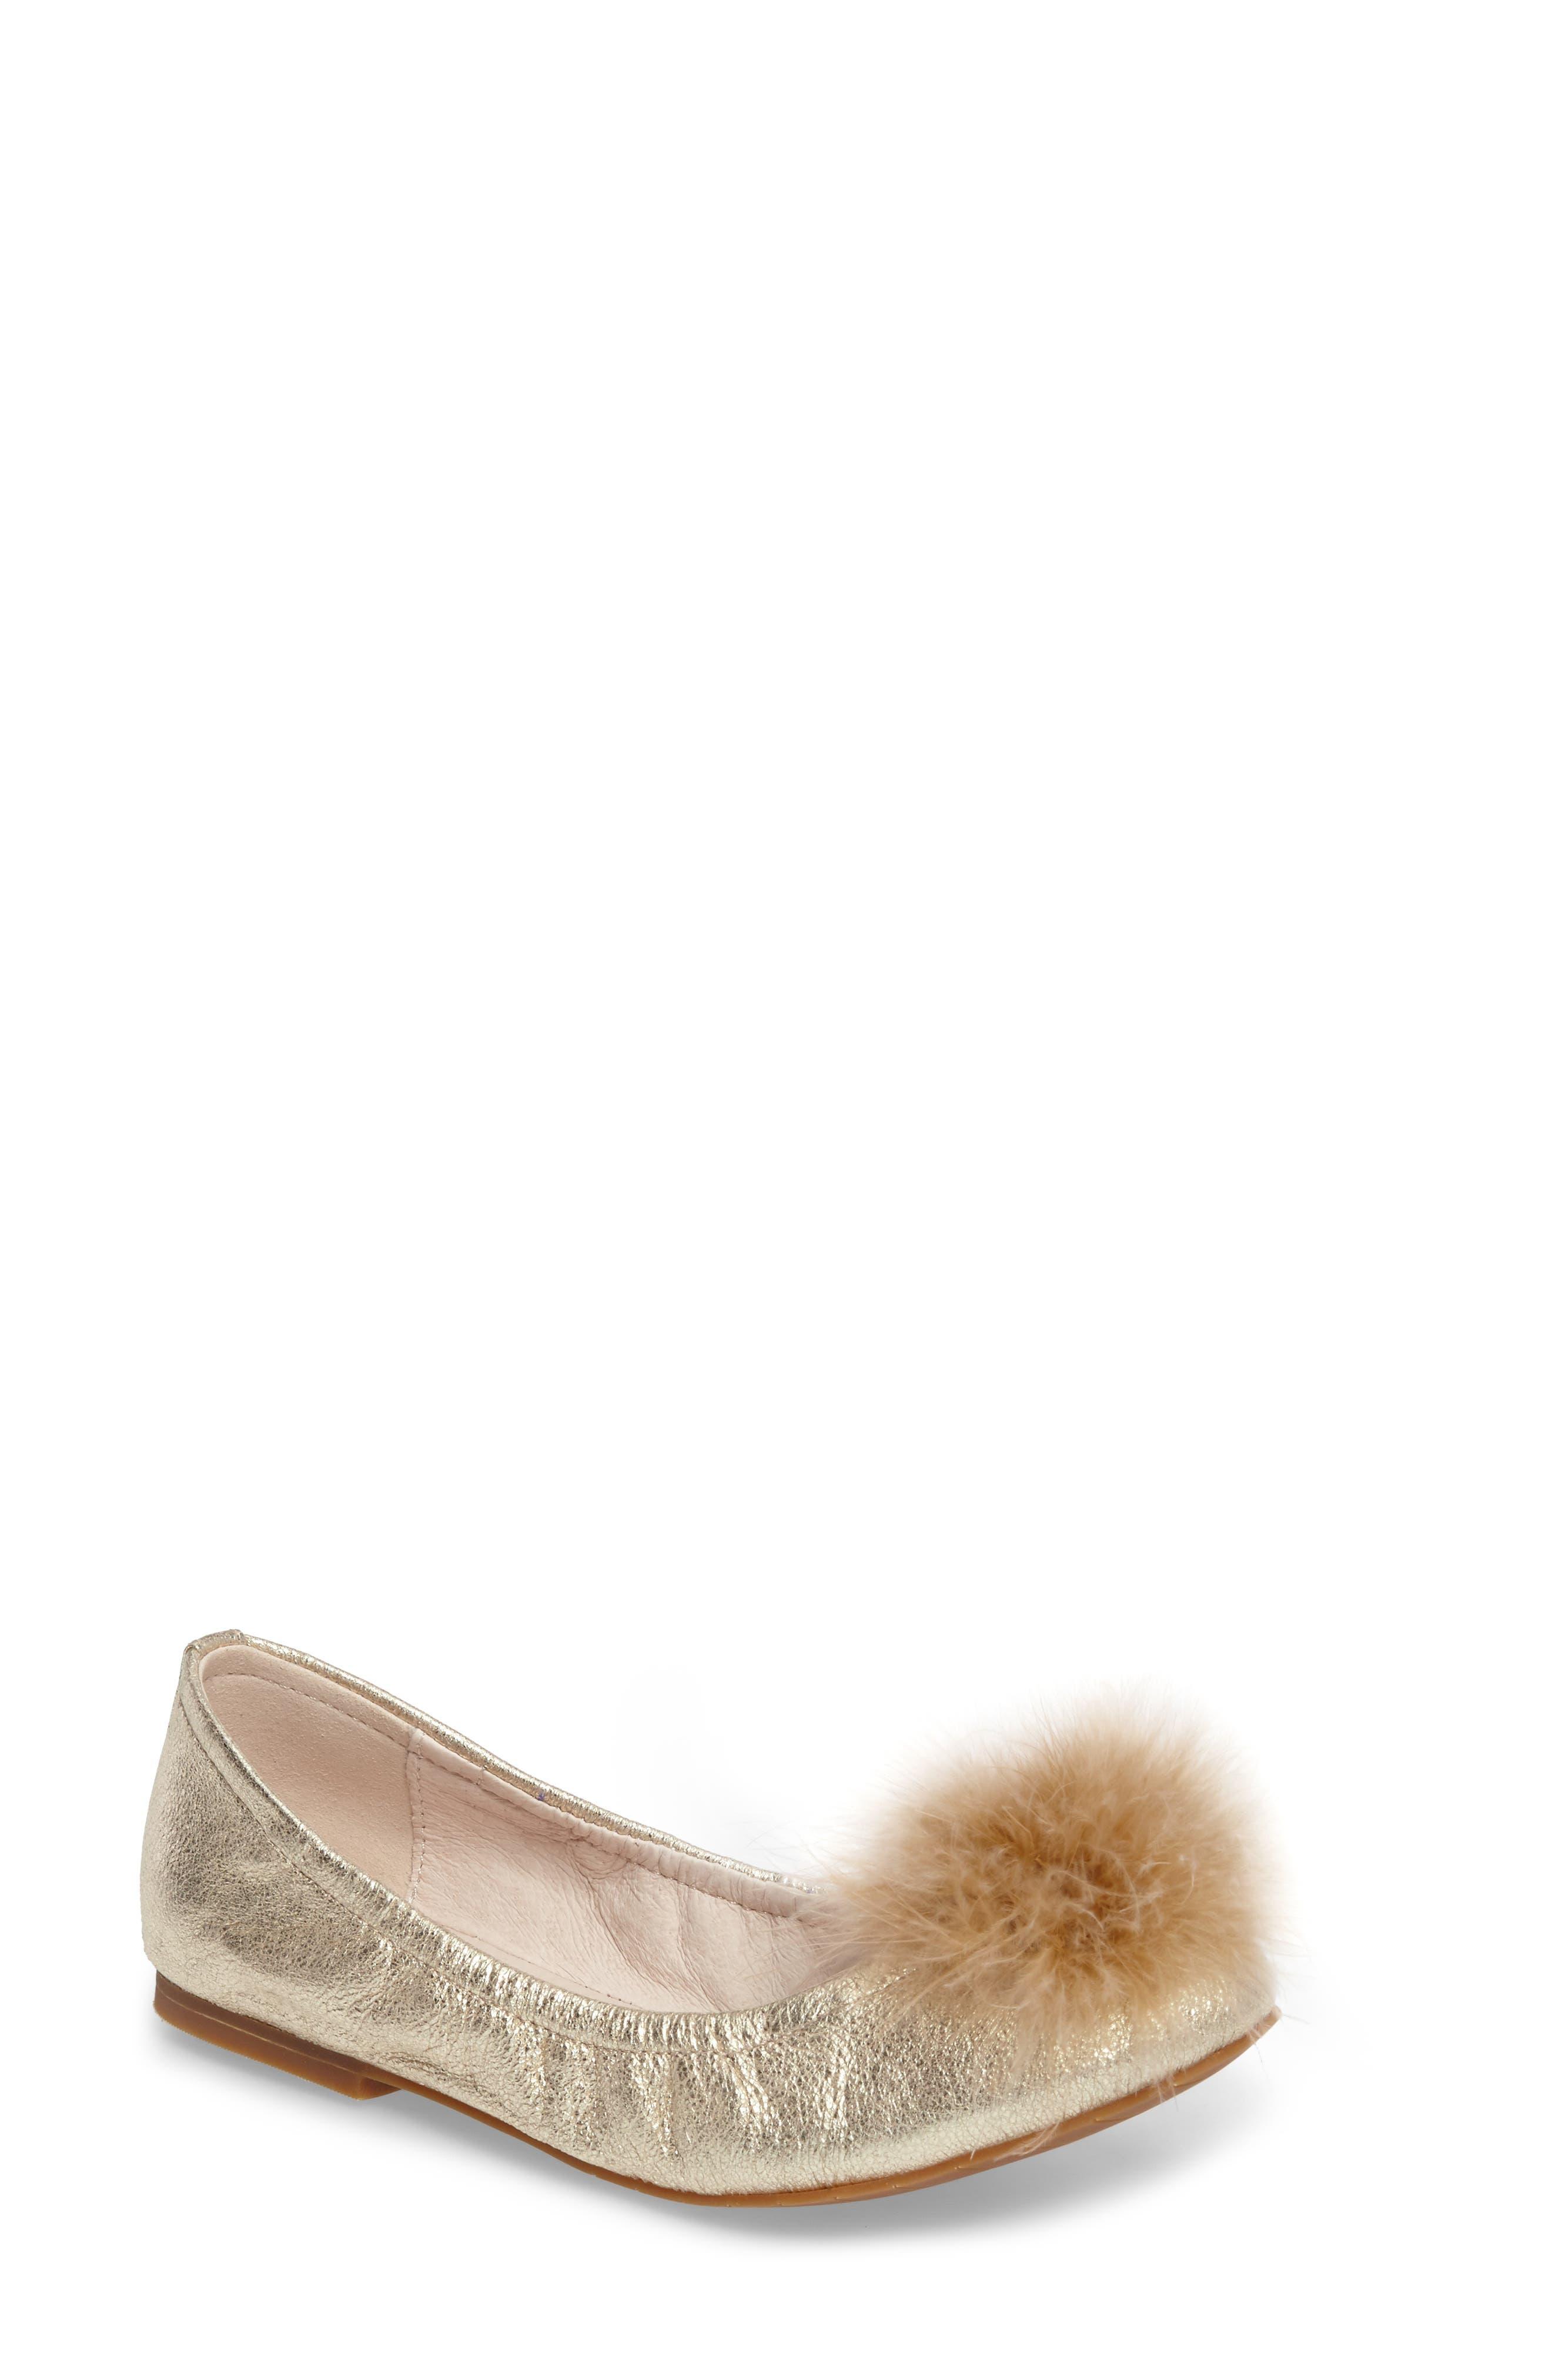 Main Image - Kenneth Cole New York Priscella Ballet Flat (Women)